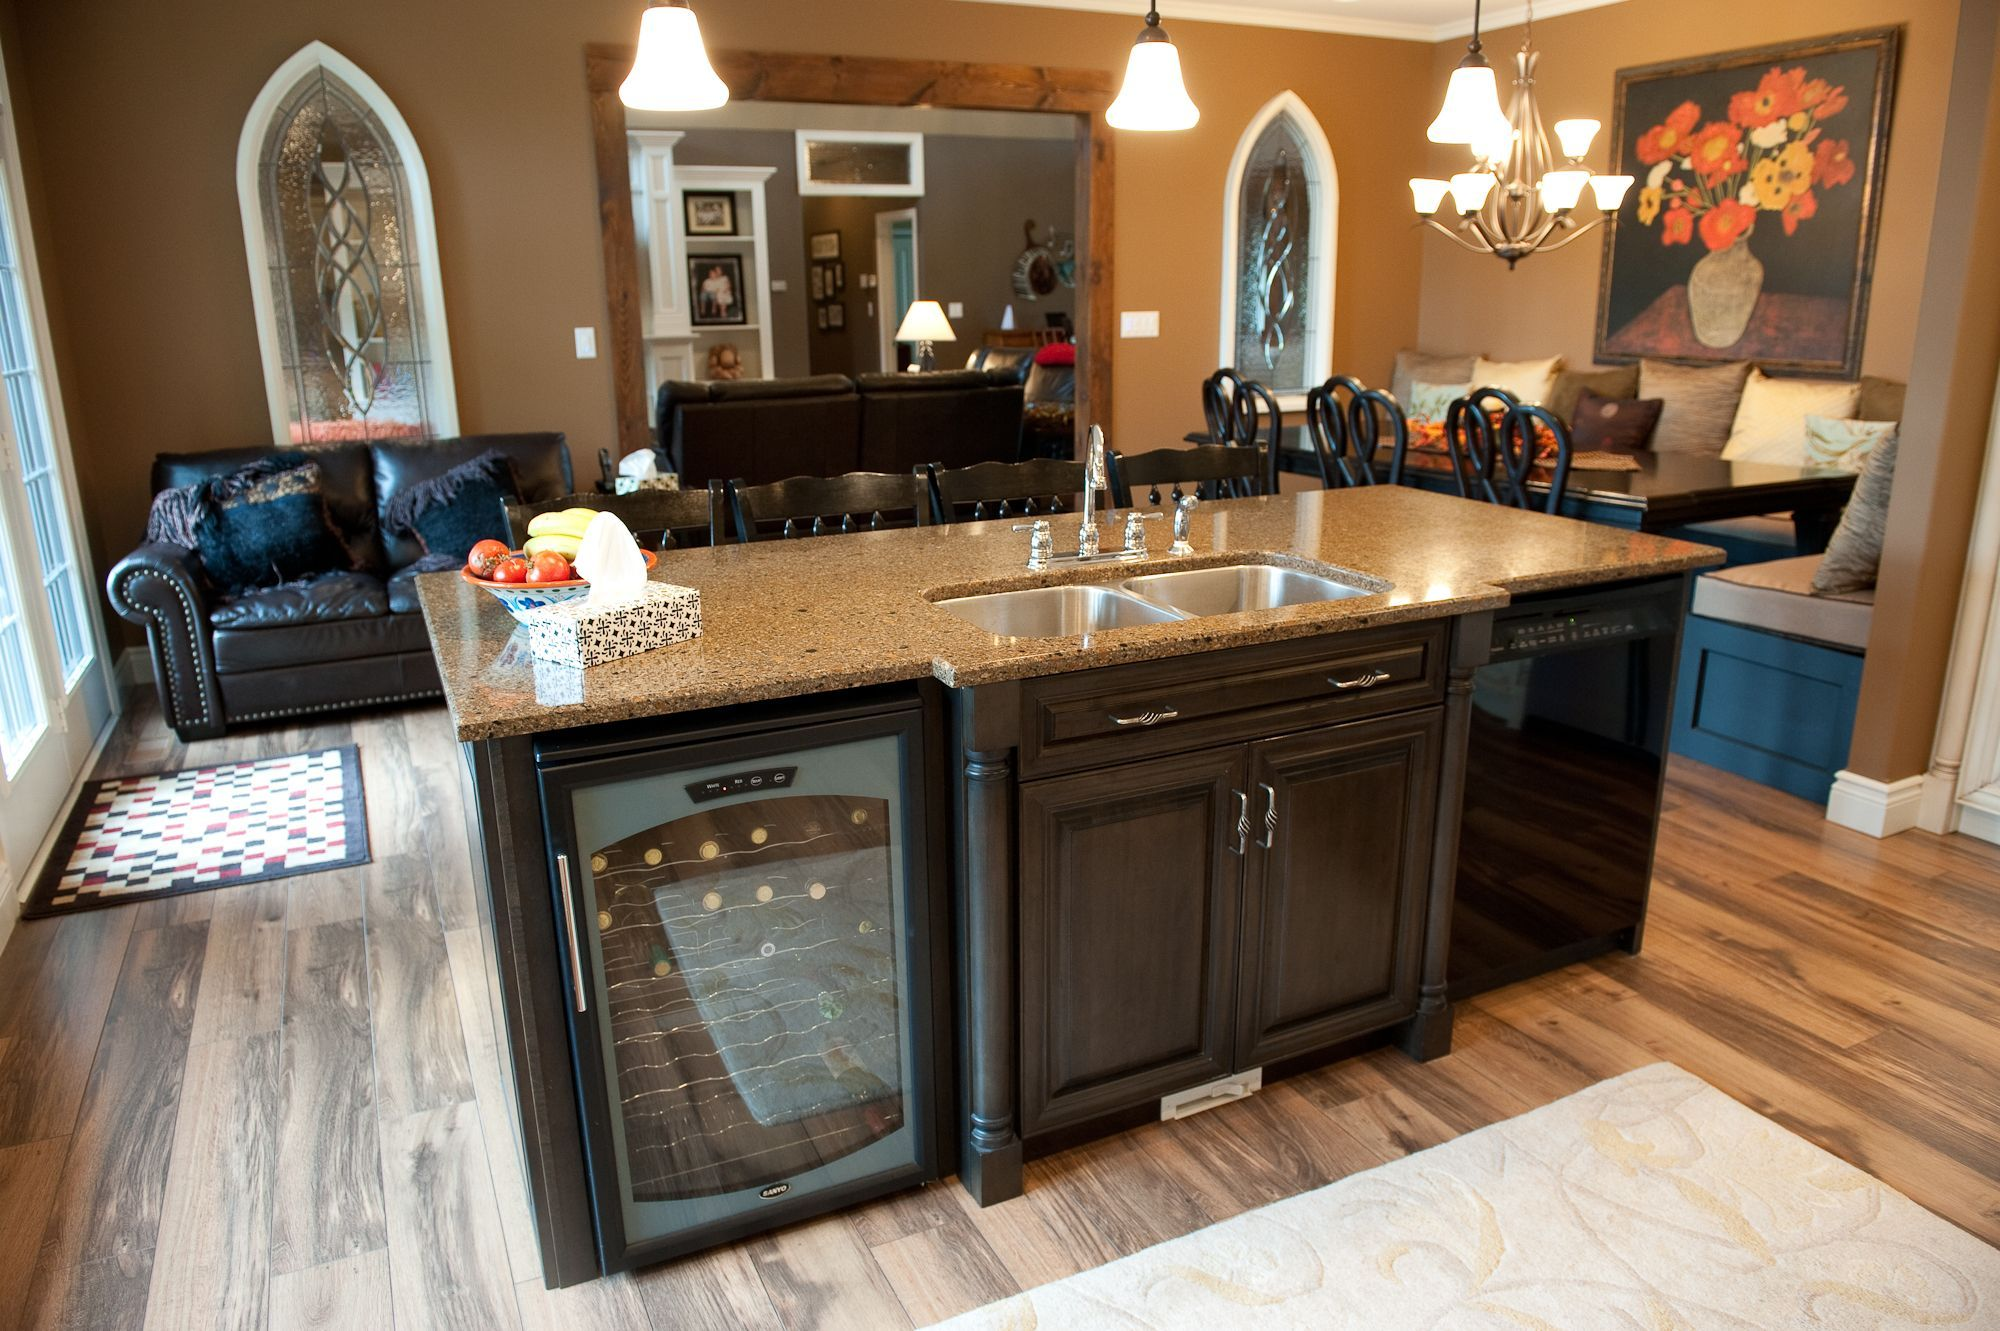 Brillian 6 Foot Kitchen Island With Sink And Dishwasher Kitchen